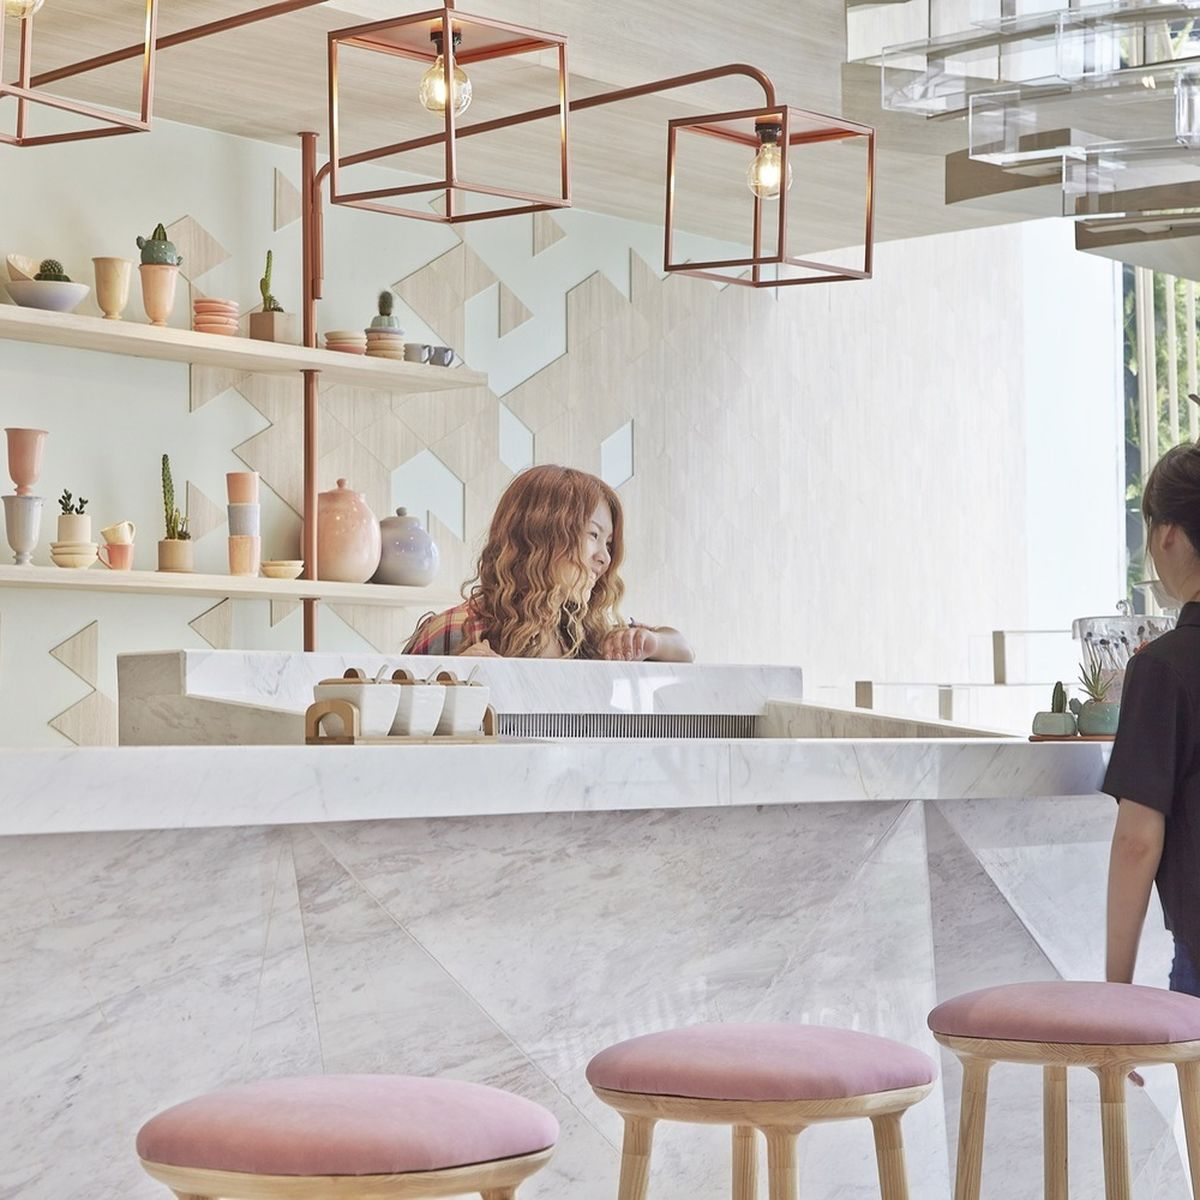 Design-Forward Ice Cream Shops